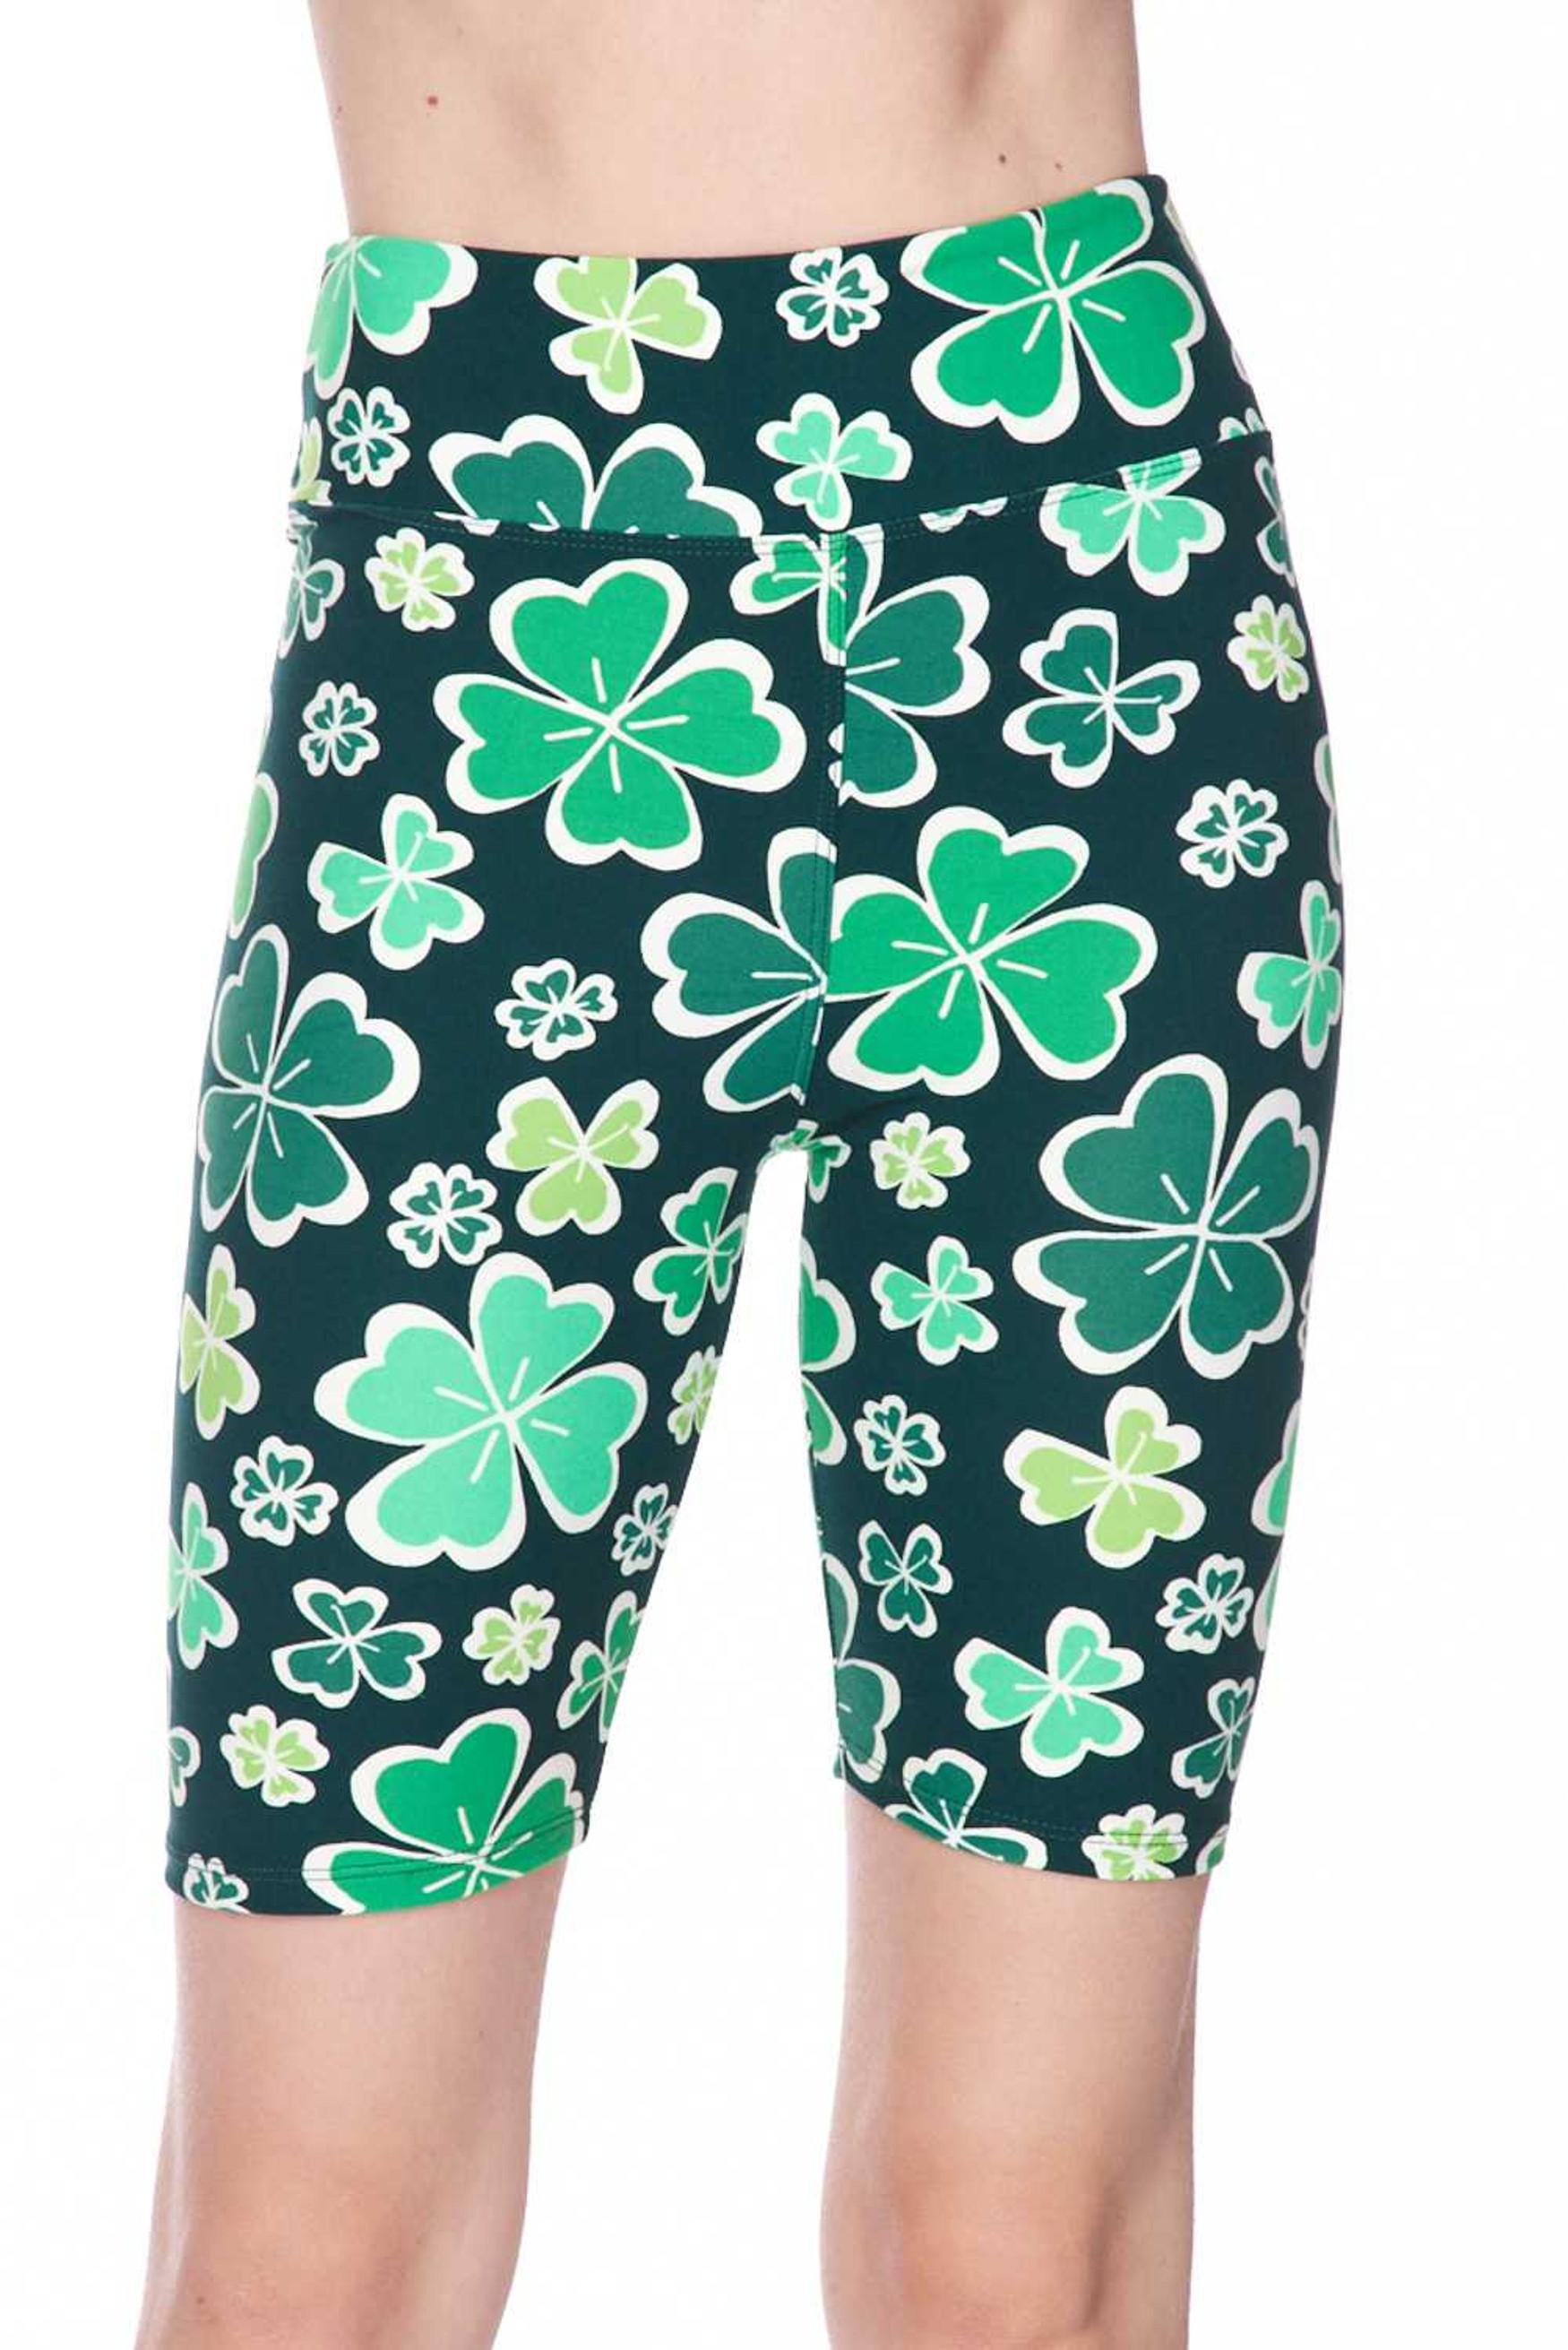 Brushed  Green Irish Clover Plus Size Shorts - 3 Inch